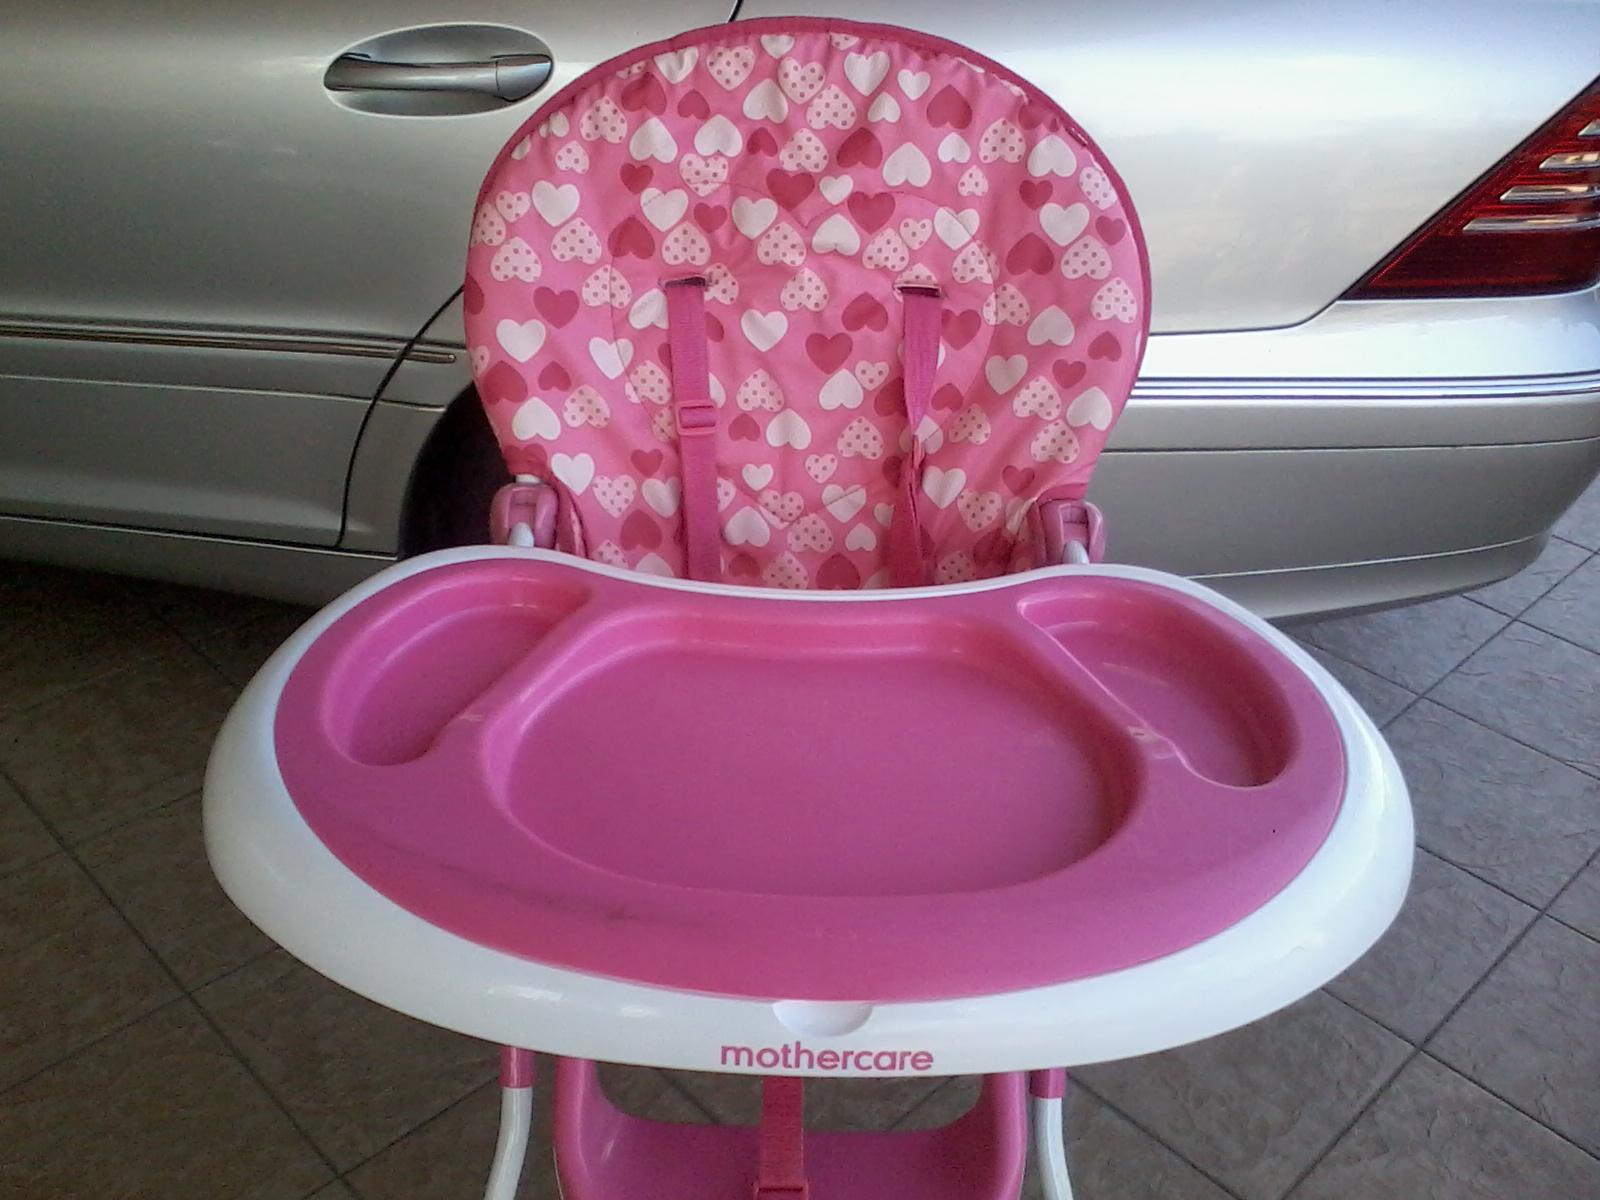 aliff preloved store mothercare high chair : Photo2005 from aliffprelovedstore.blogspot.com size 1600 x 1200 jpeg 581kB